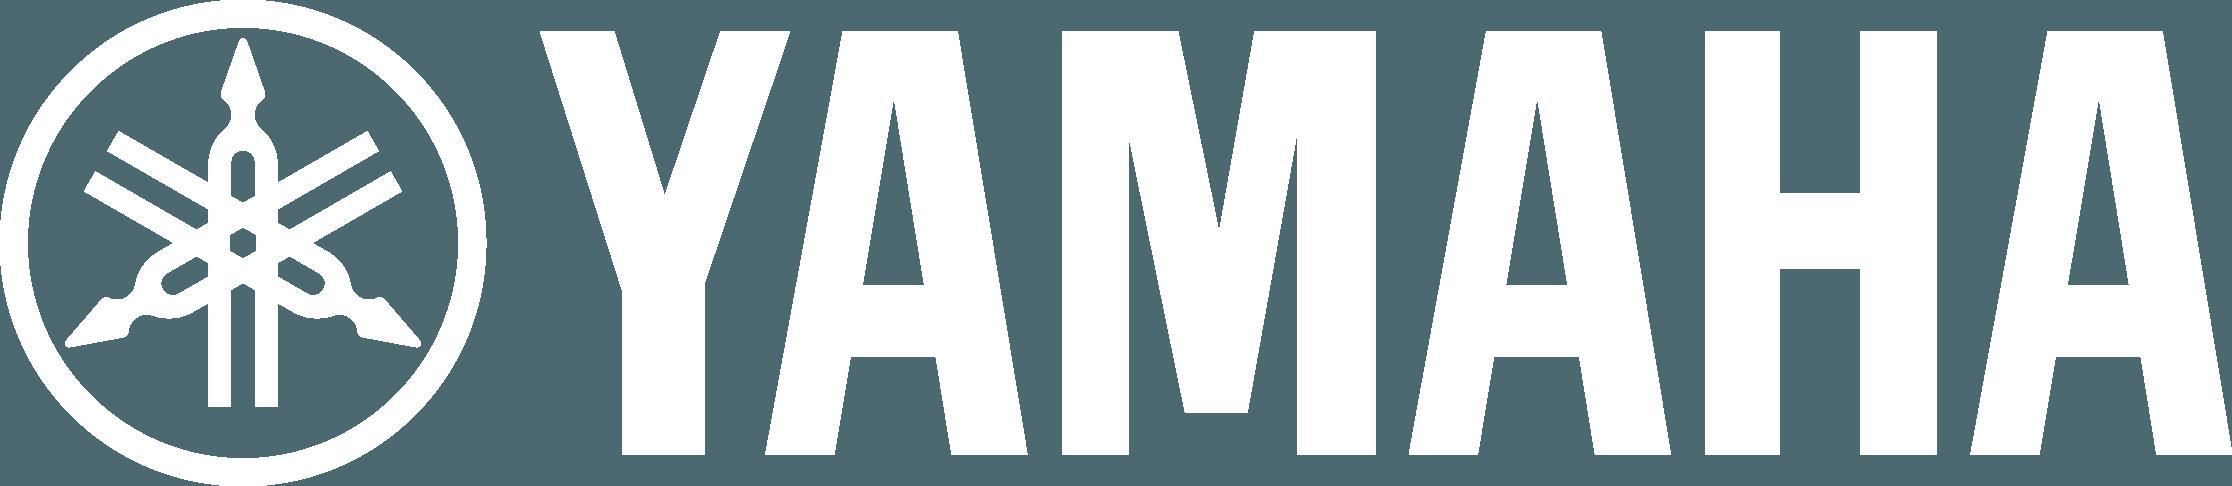 yamaha white logo logodix yamaha white logo logodix